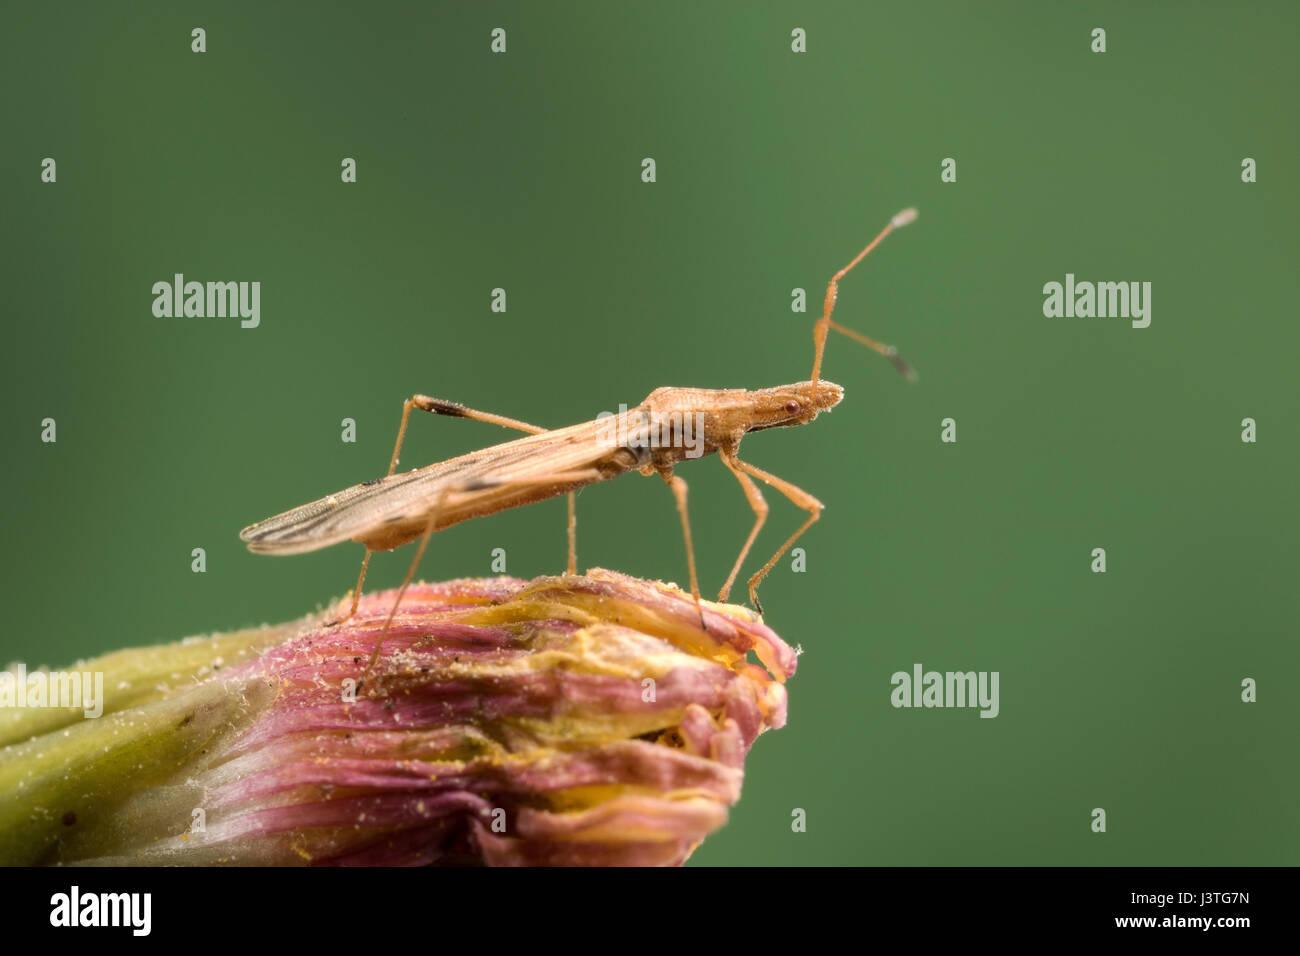 Kleine längliche Körper Käfer Stockbild